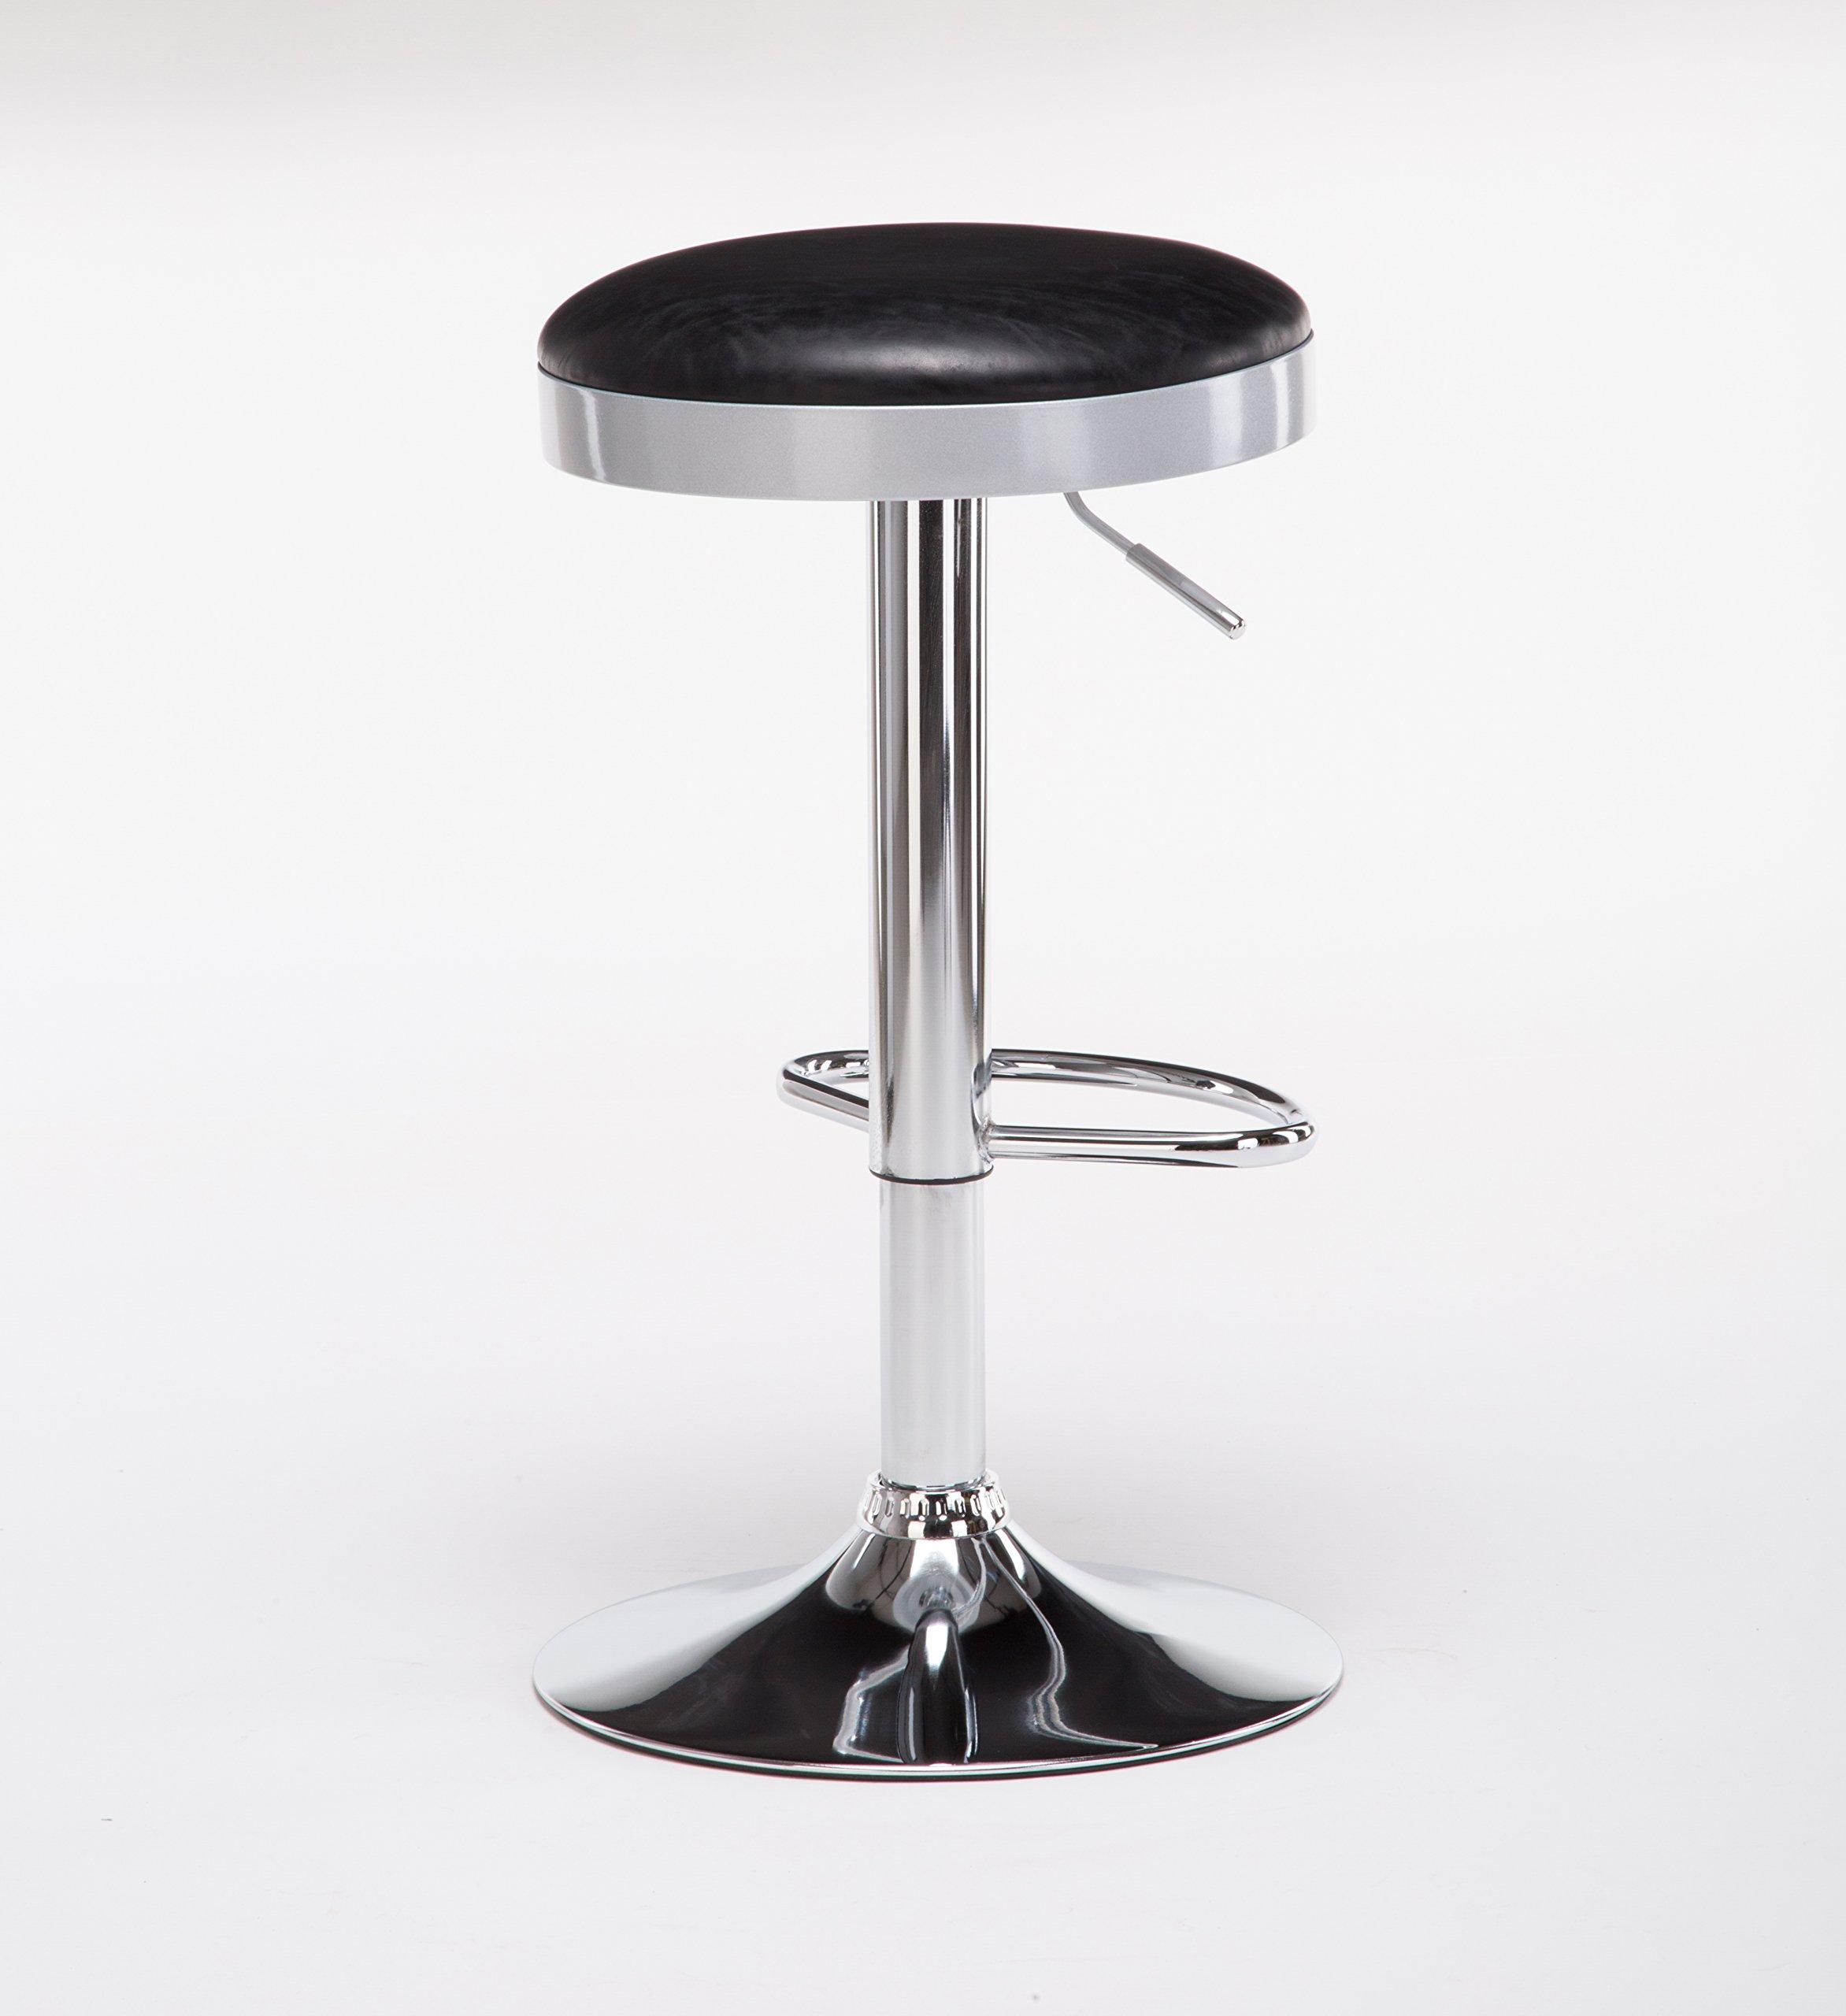 Boraam  Copley Backless Stool, 1-Pack, Adjustable Height, Black by Boraam (Image #4)